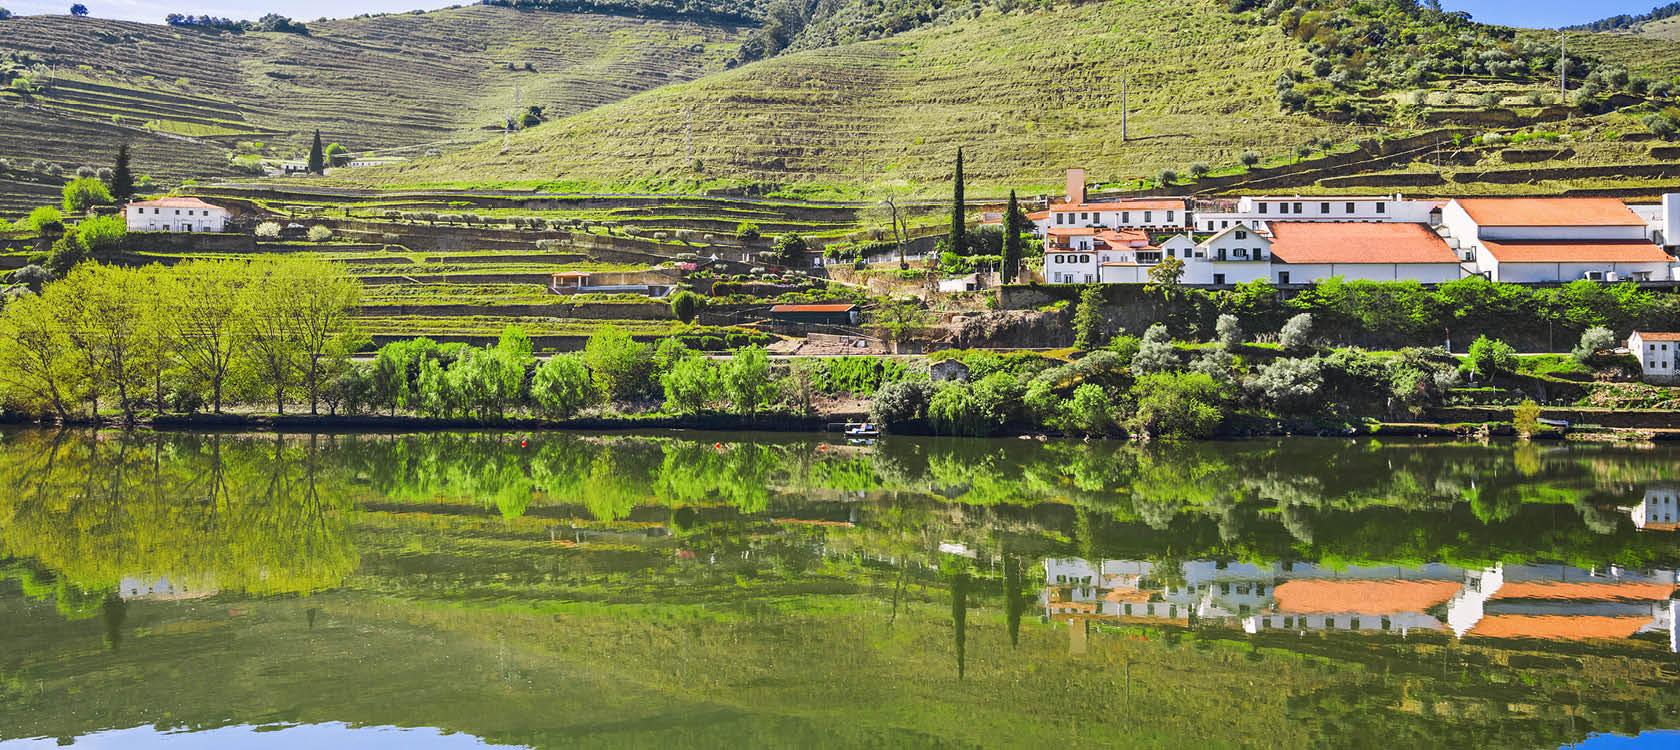 Pinhao i norra Portugal.